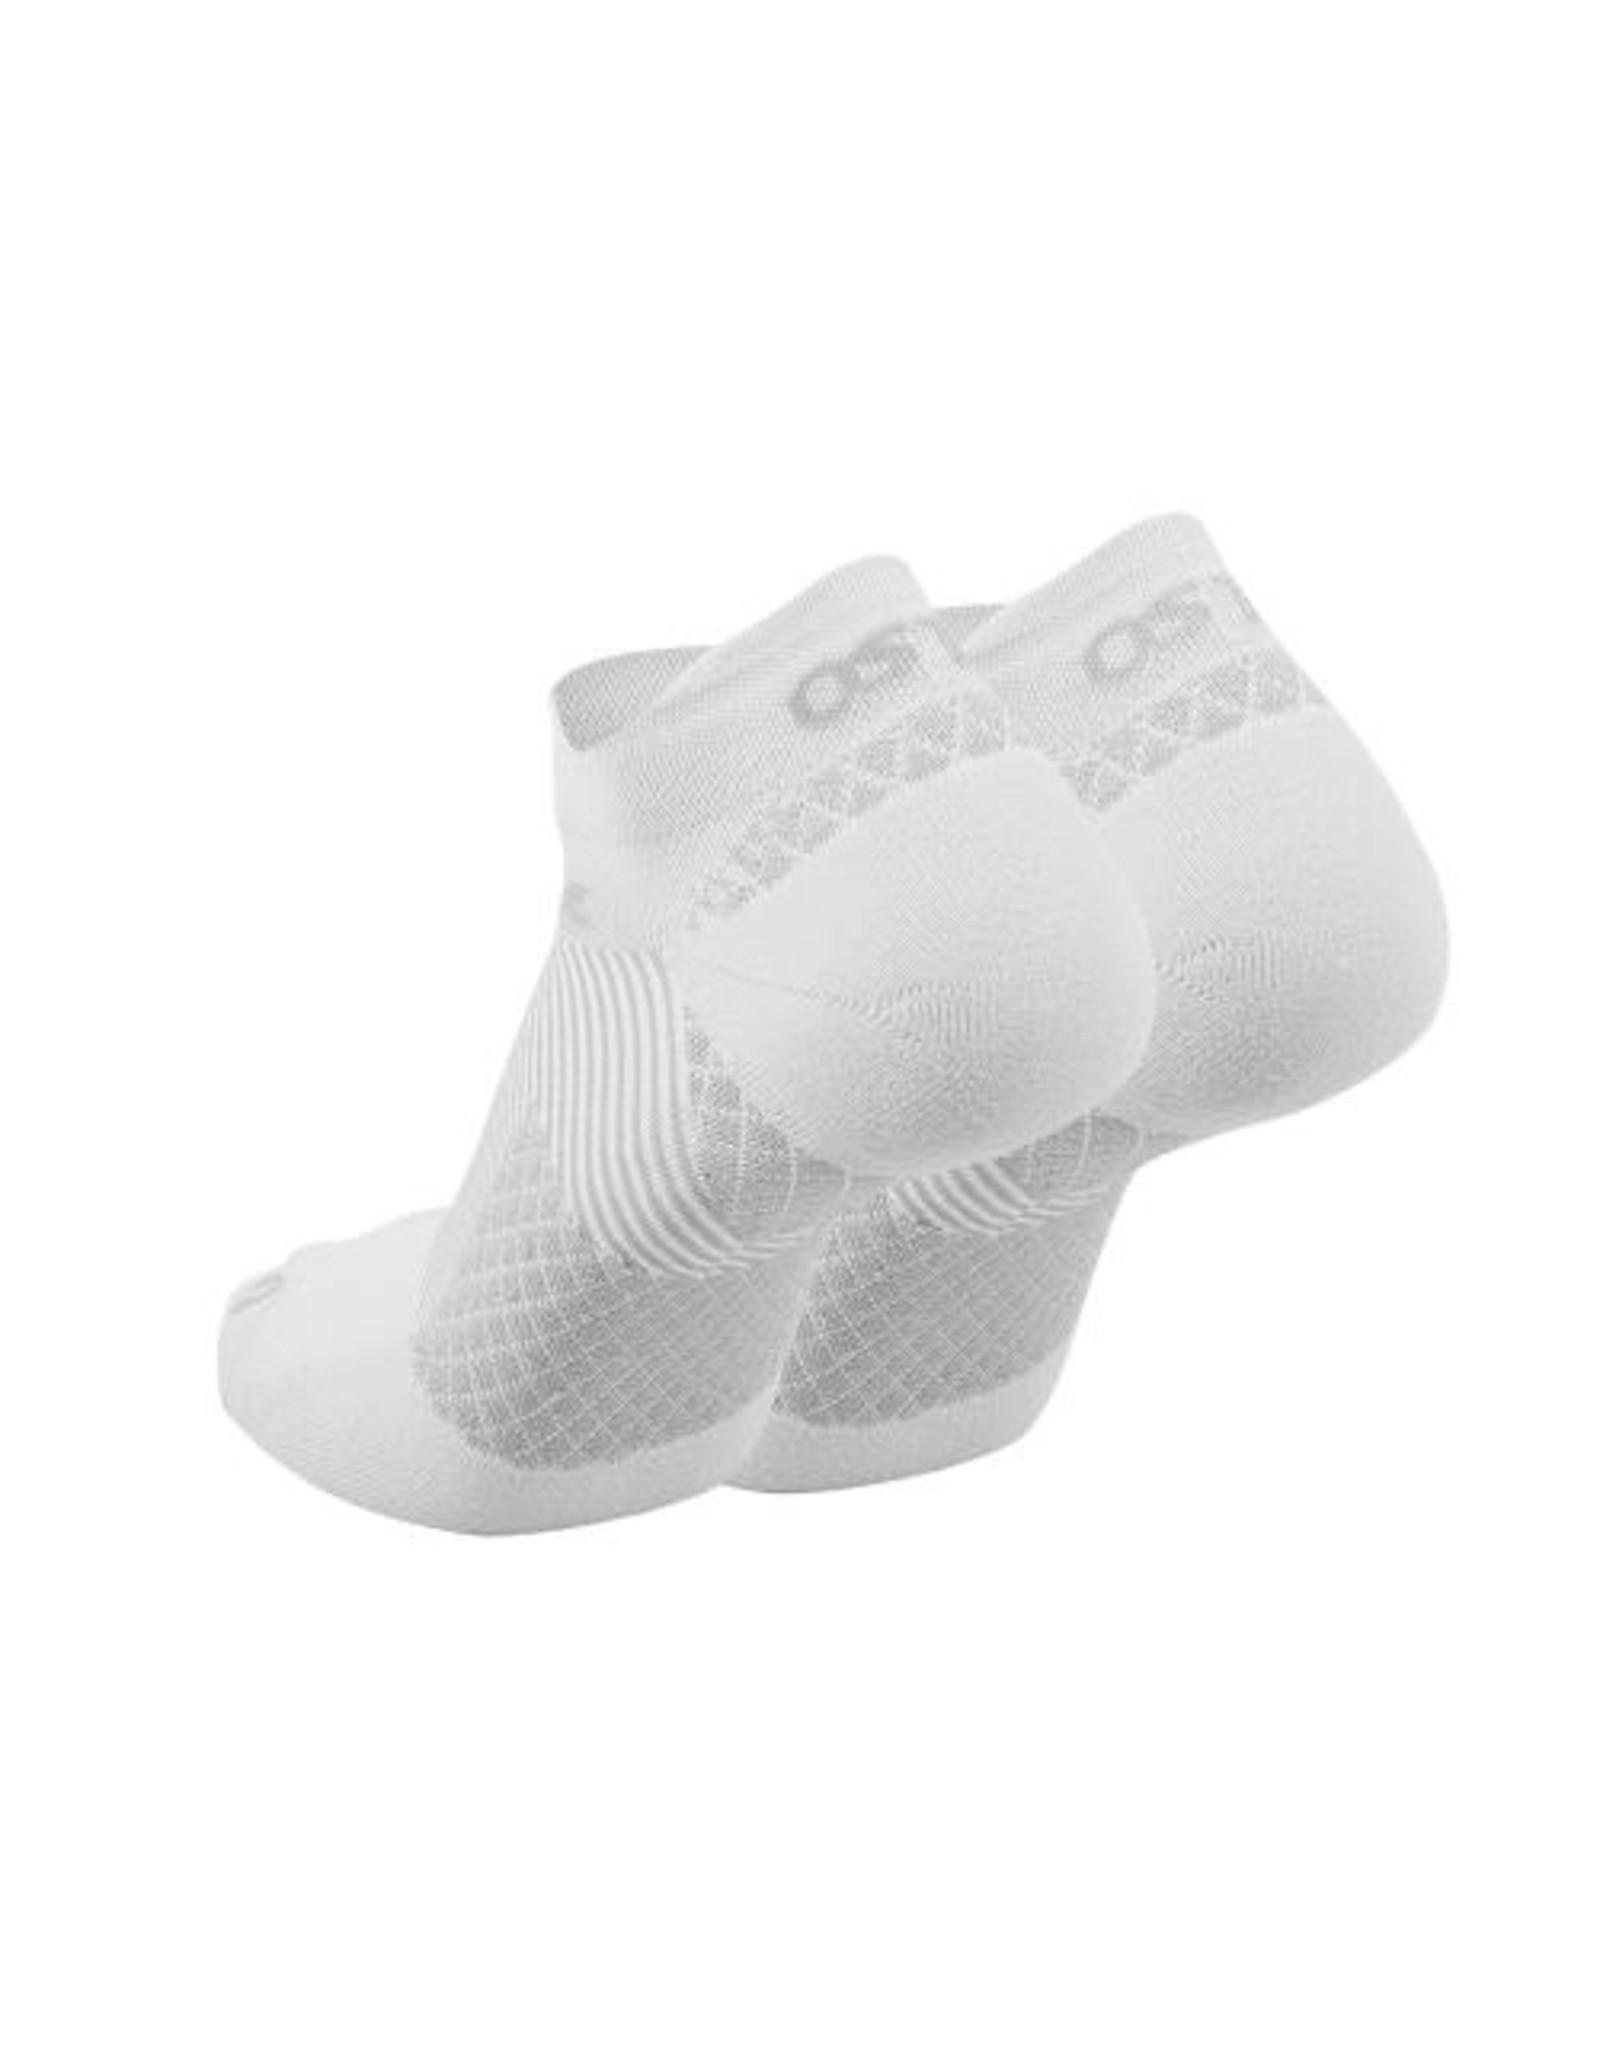 OS1st OS1st FS4 Plantar Fasciitis No Show Compression Sock